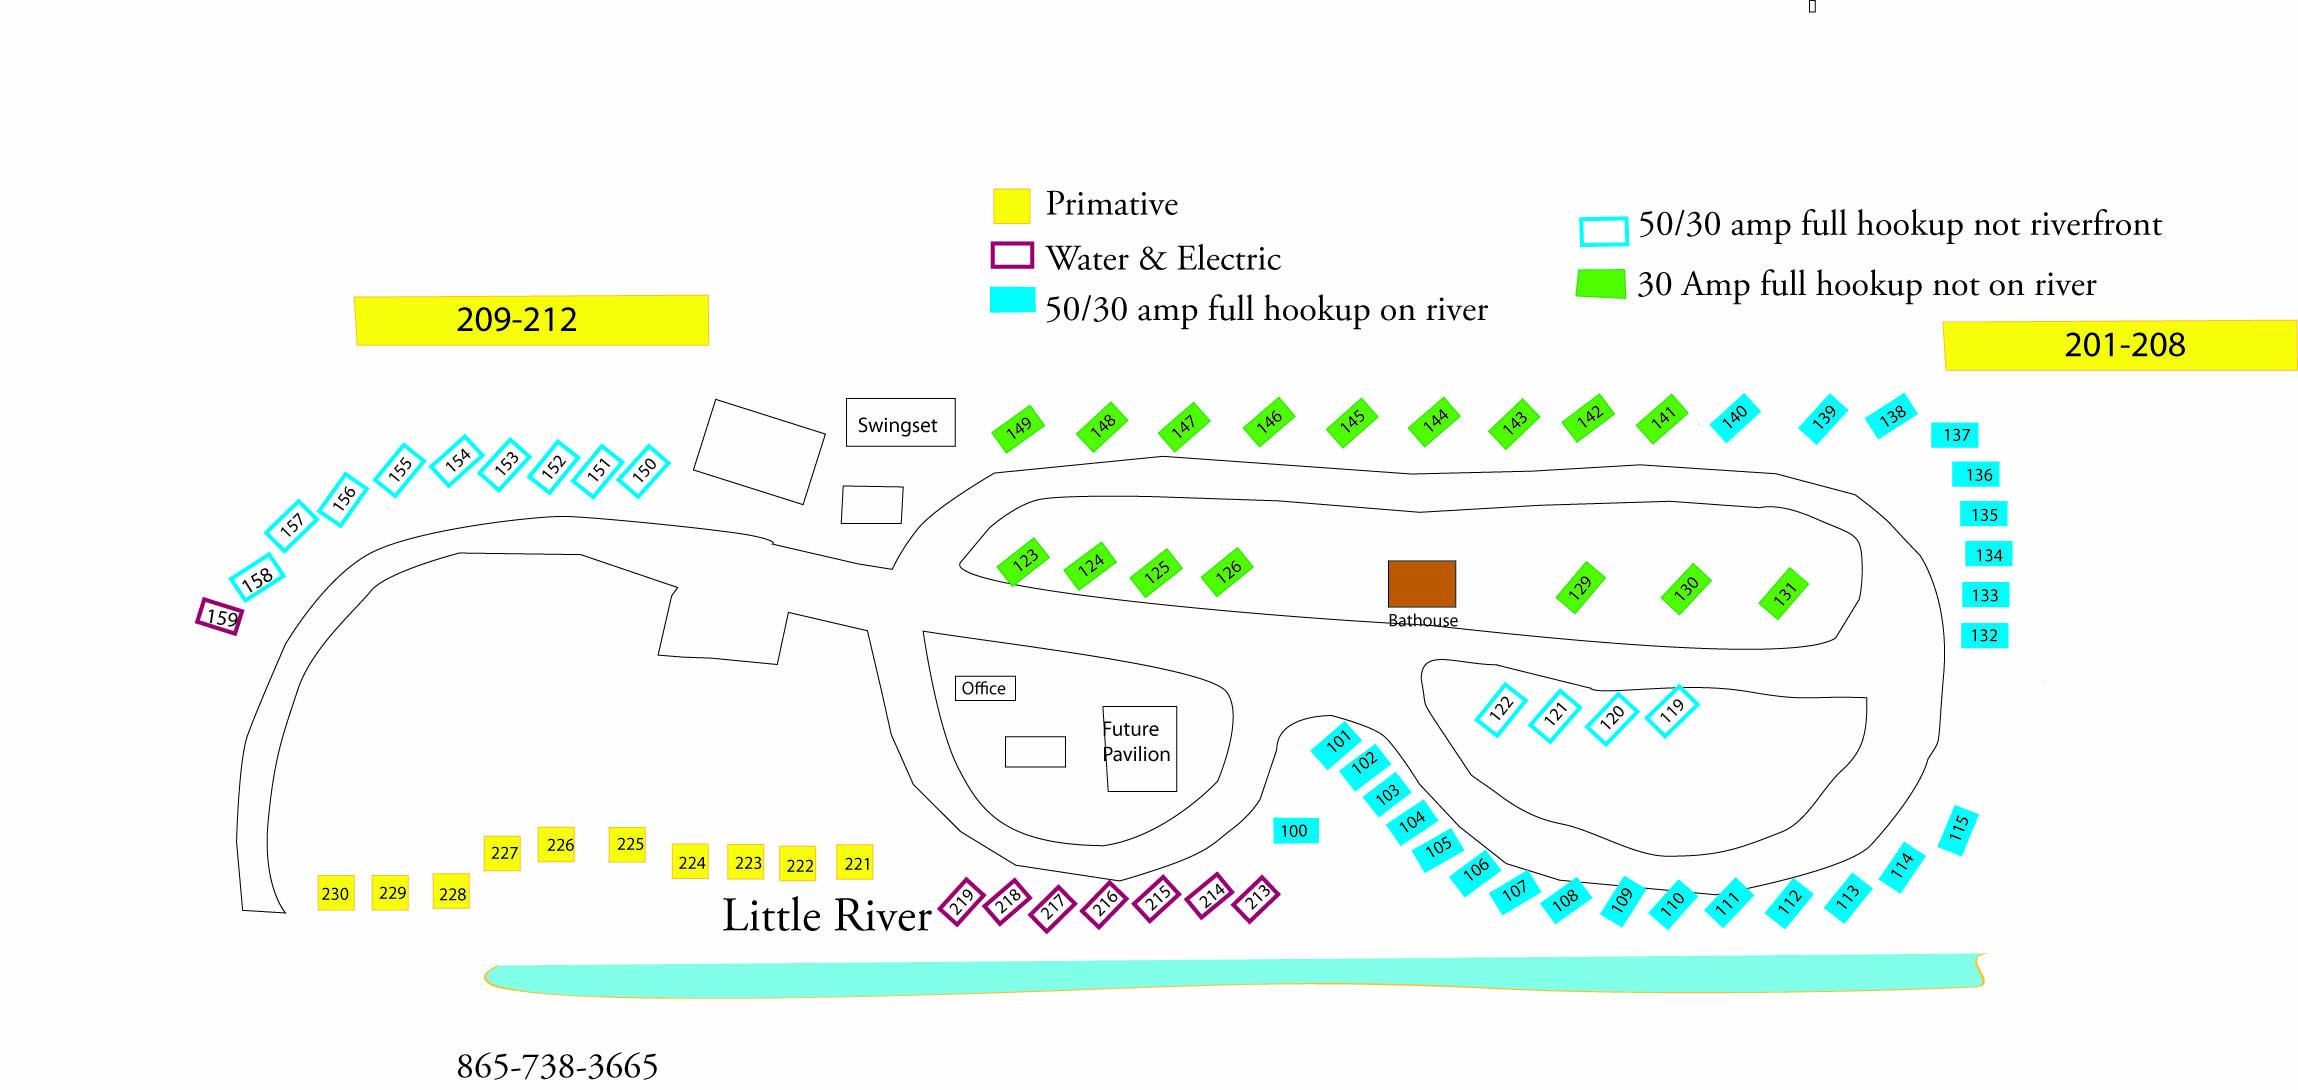 Little River Campground & RV Resort campsite map